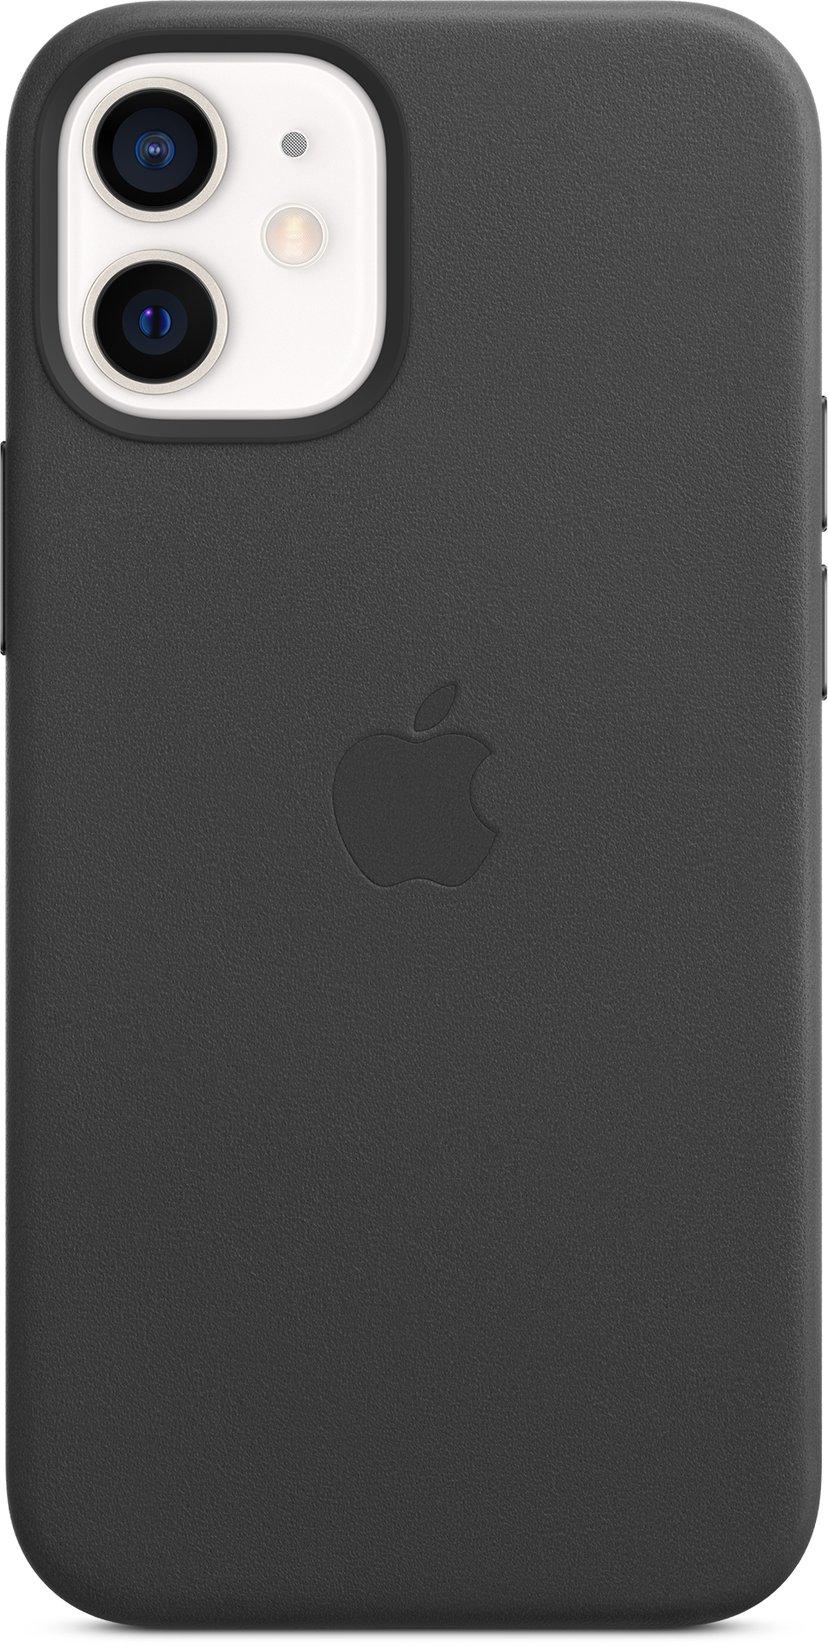 Apple Leather Case with MagSafe iPhone 12 Mini Svart